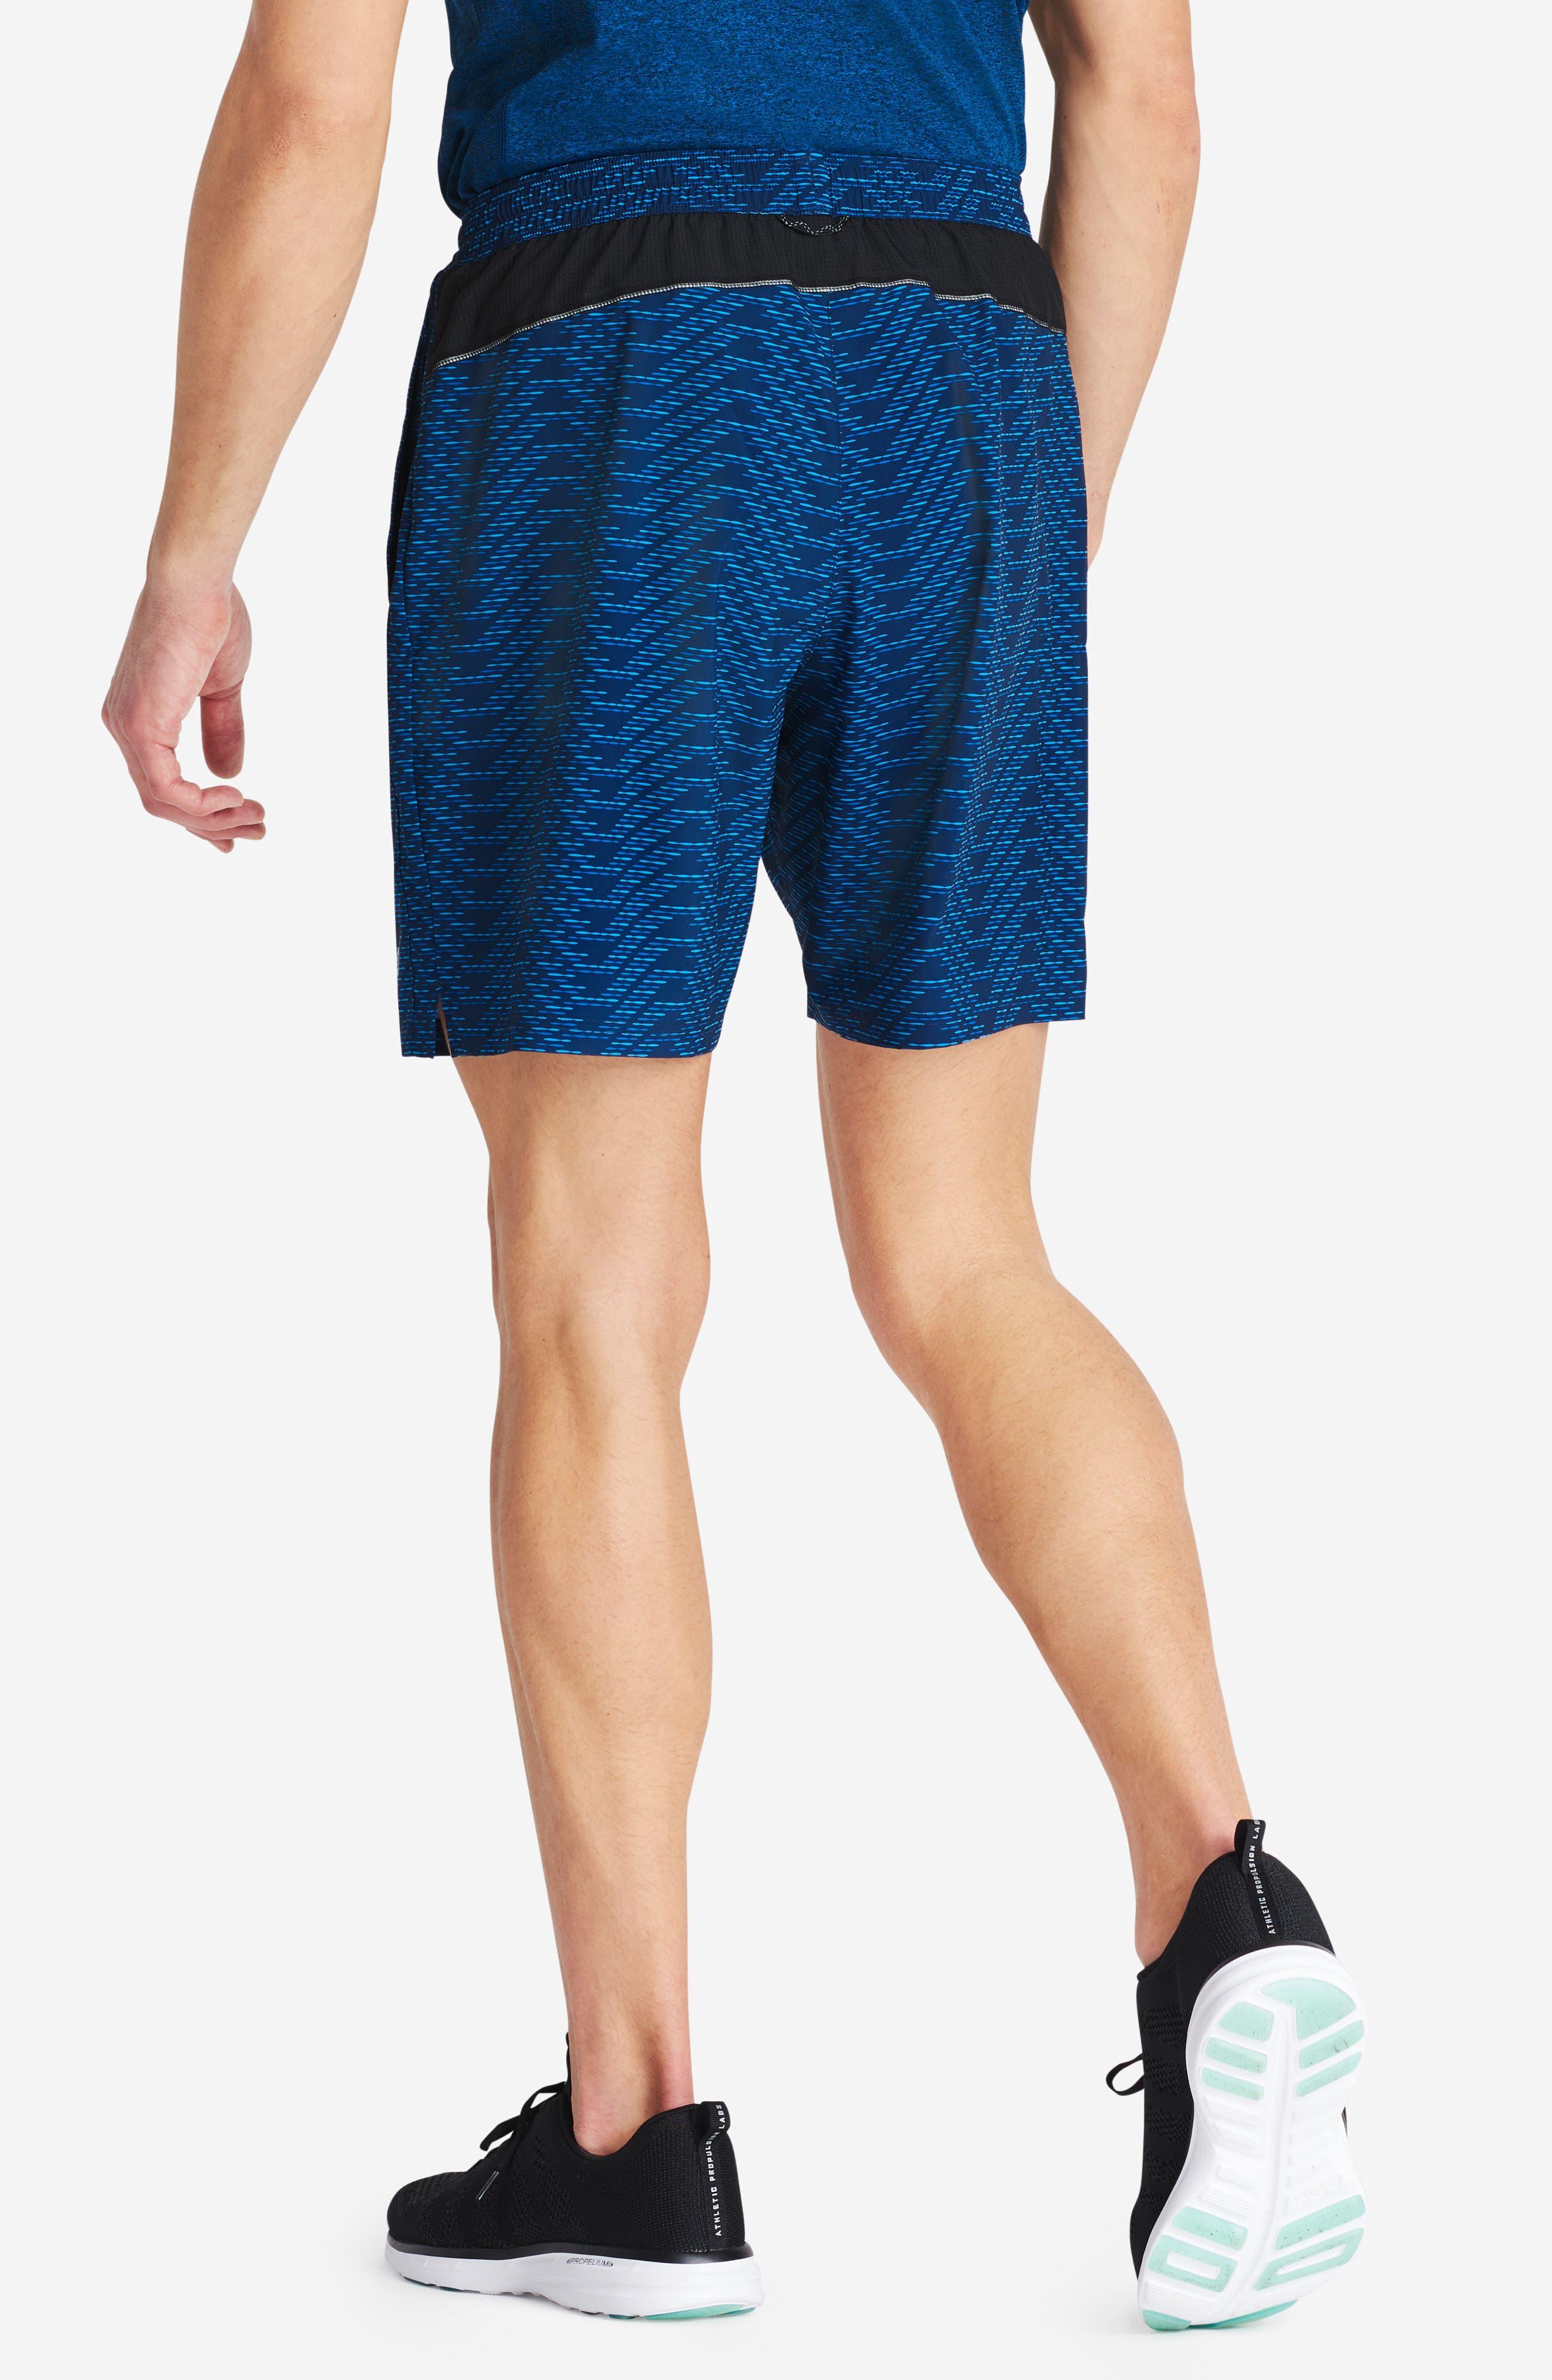 Stretch Shorts,                             Alternate thumbnail 9, color,                             CIRCUIT BREAKER